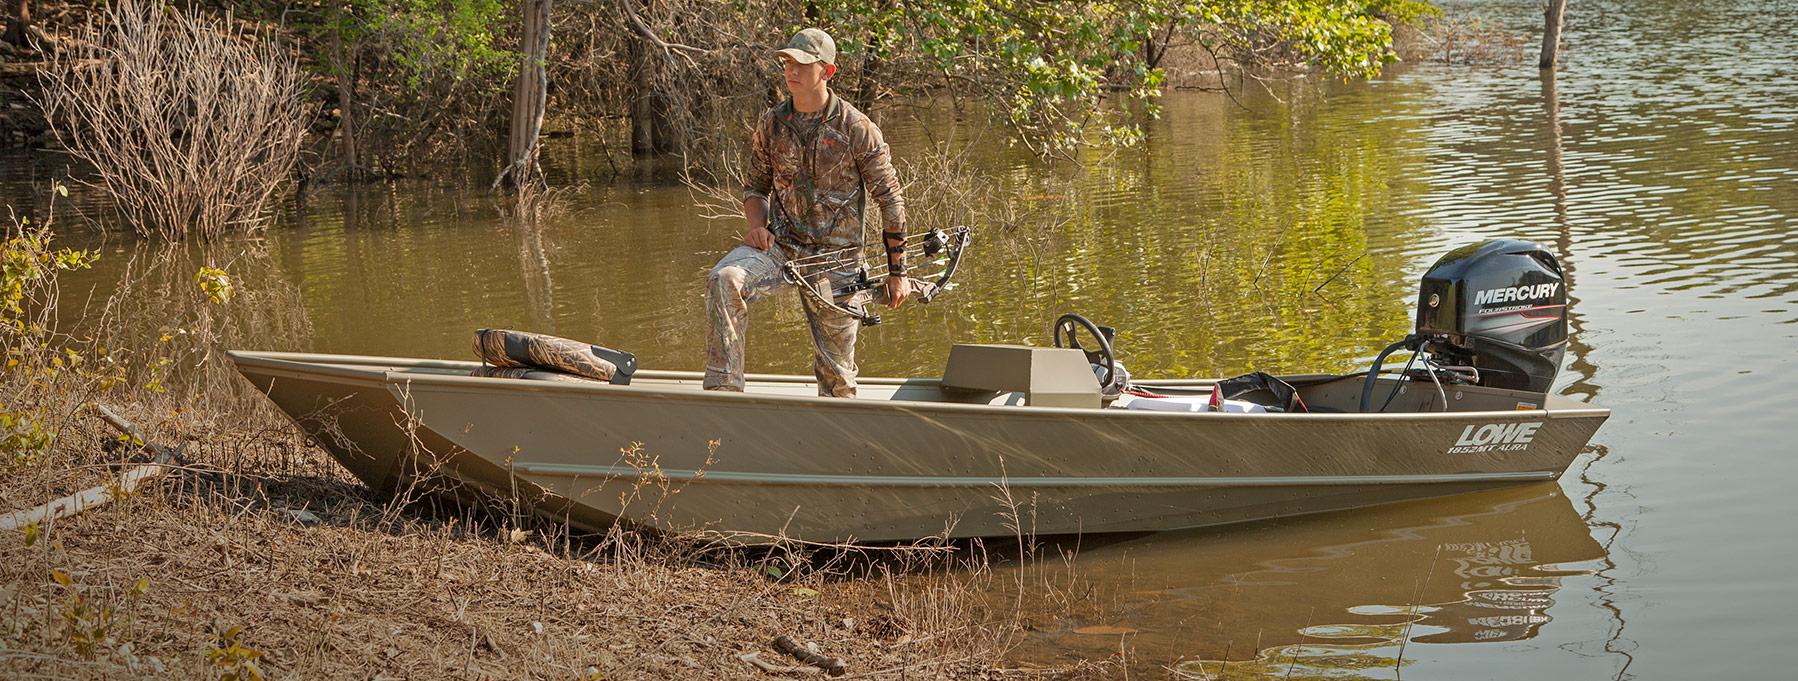 2020 Jon Aluminum Boats | Lowe Boats